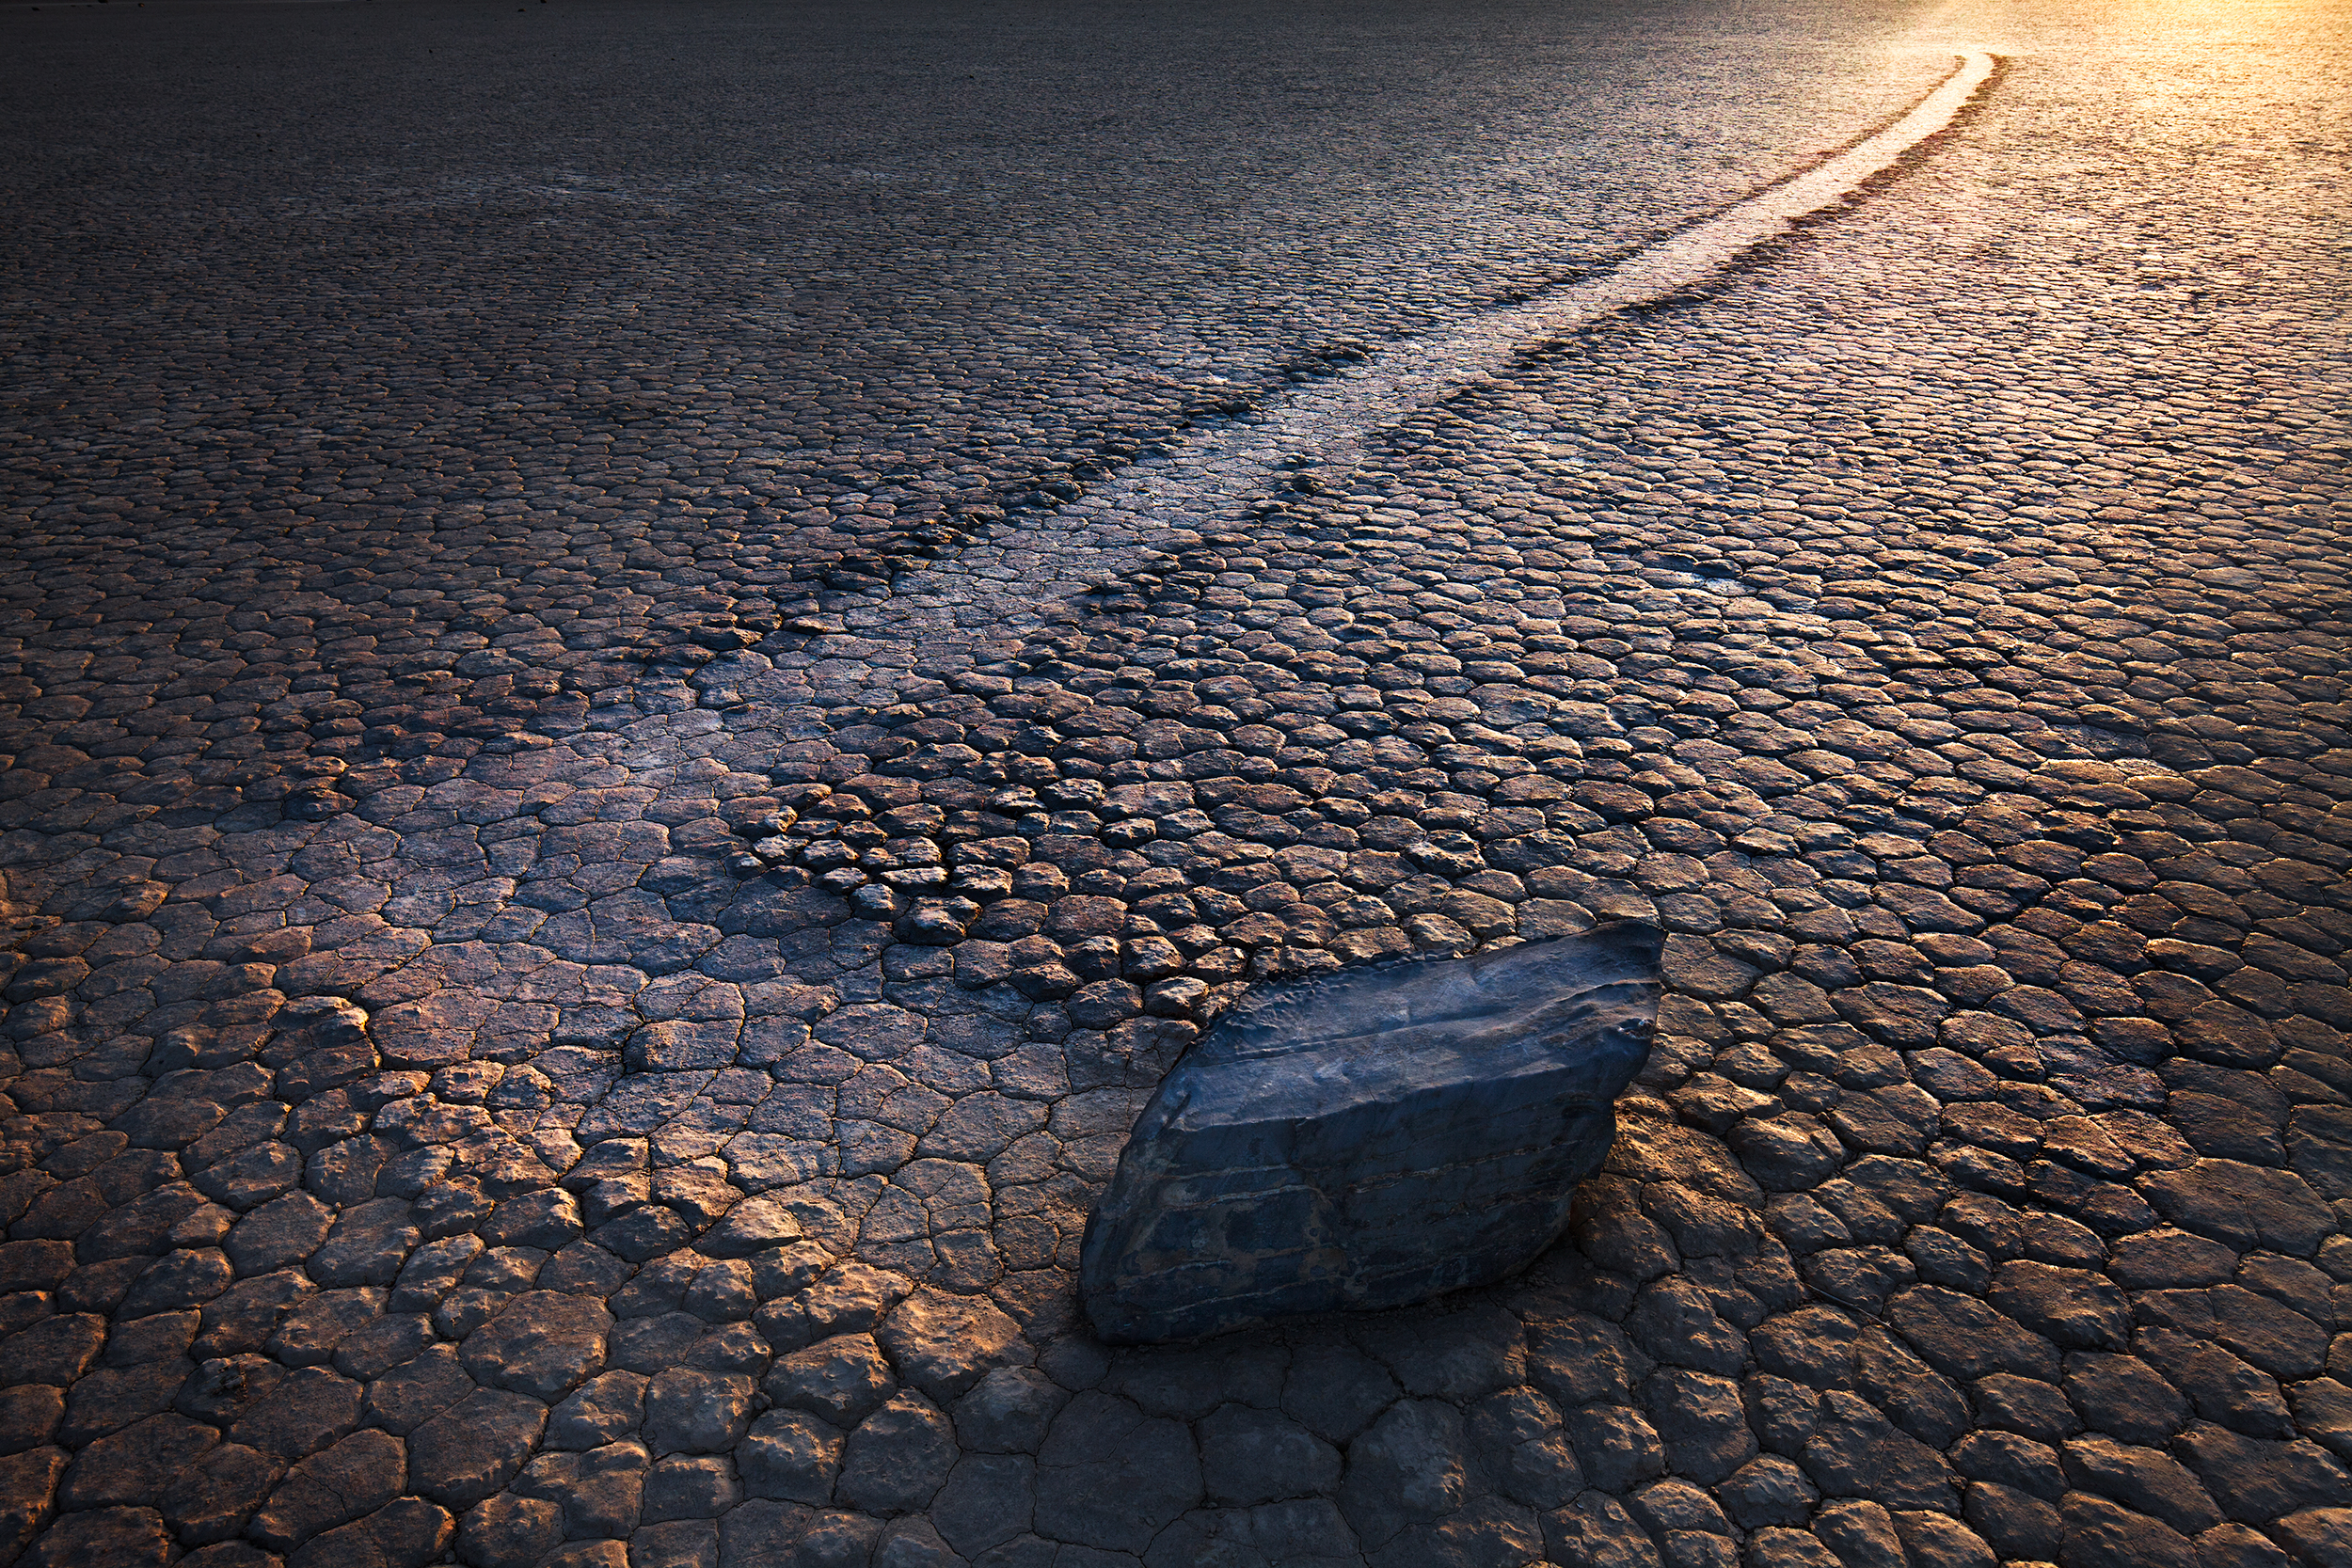 Moving Rock Left Turn - Race Track (1607)